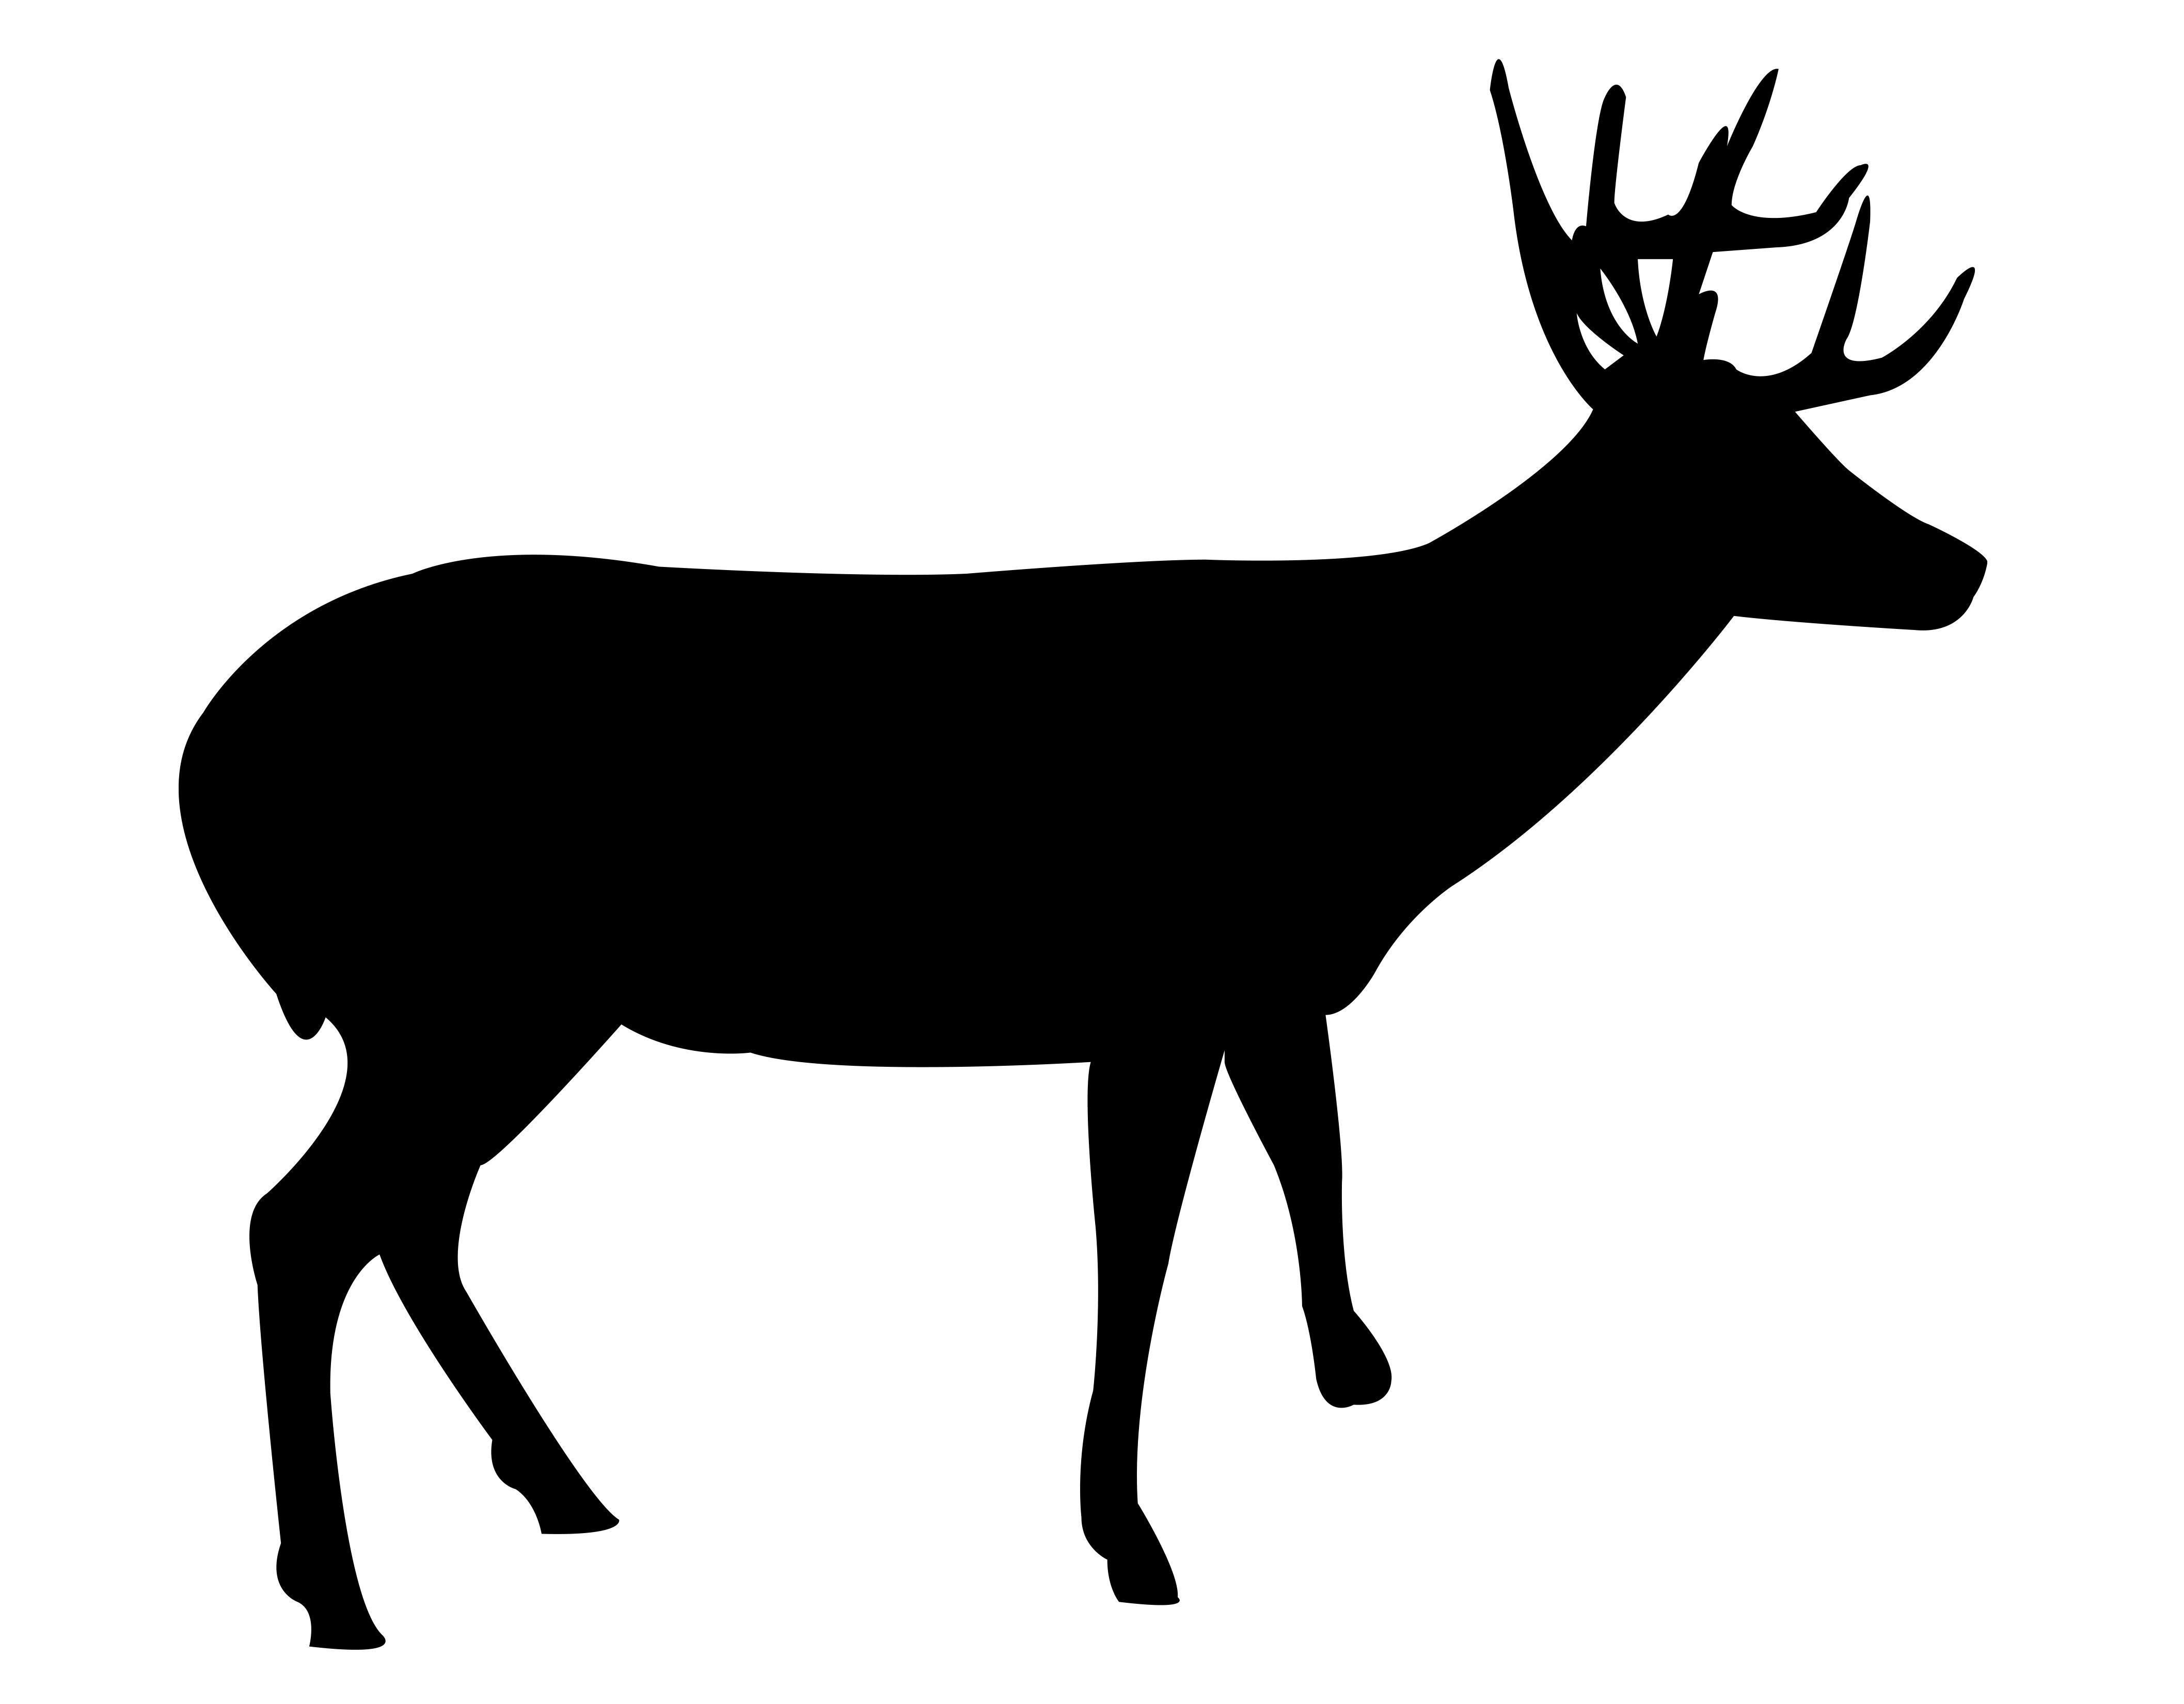 Deer Silhouette Free DXF File